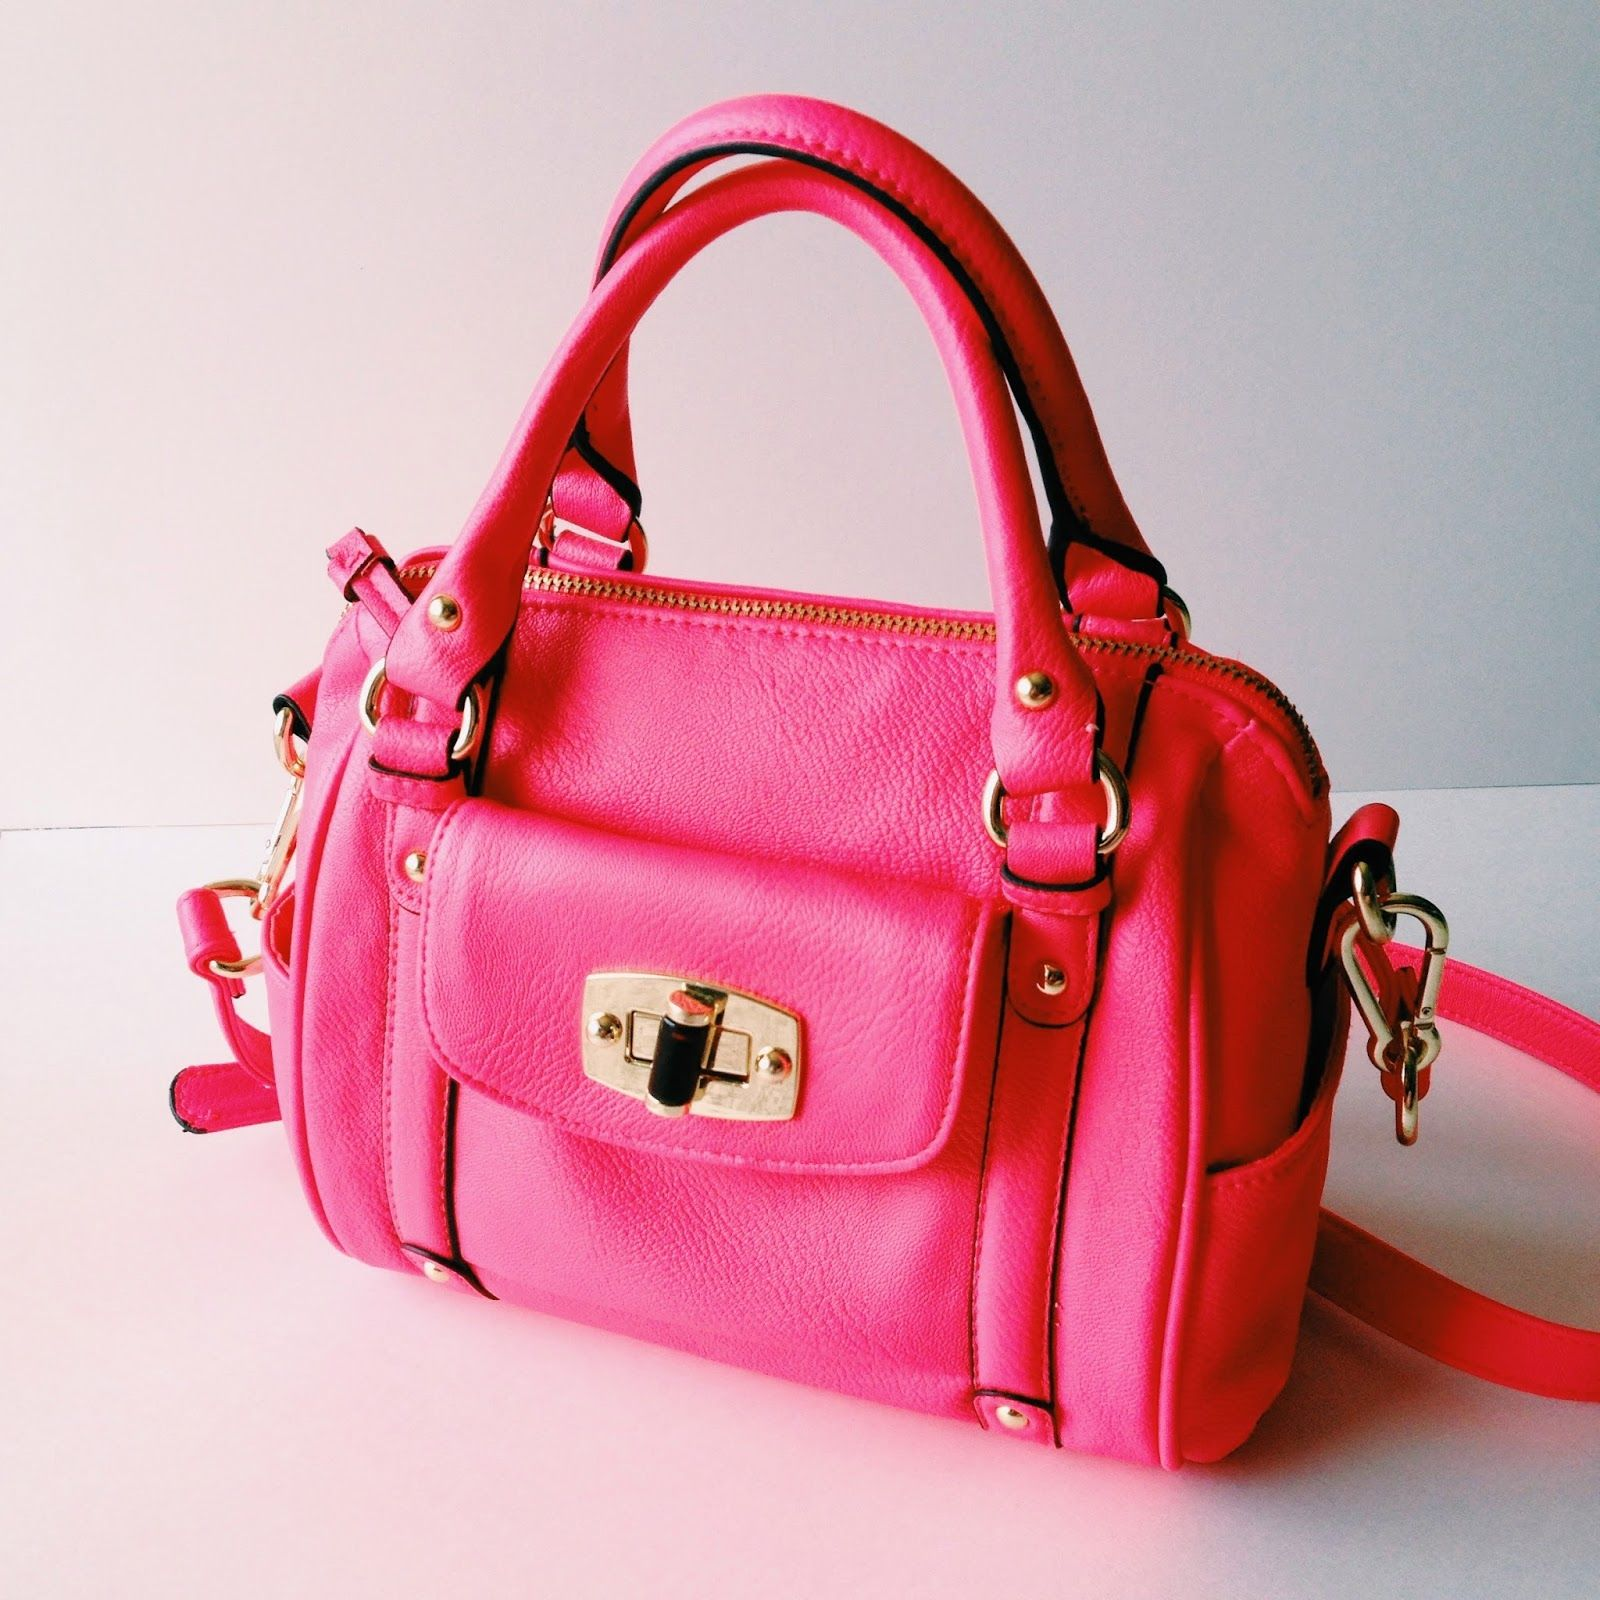 Target Merona Mini Satchel Handbag Spring Pink